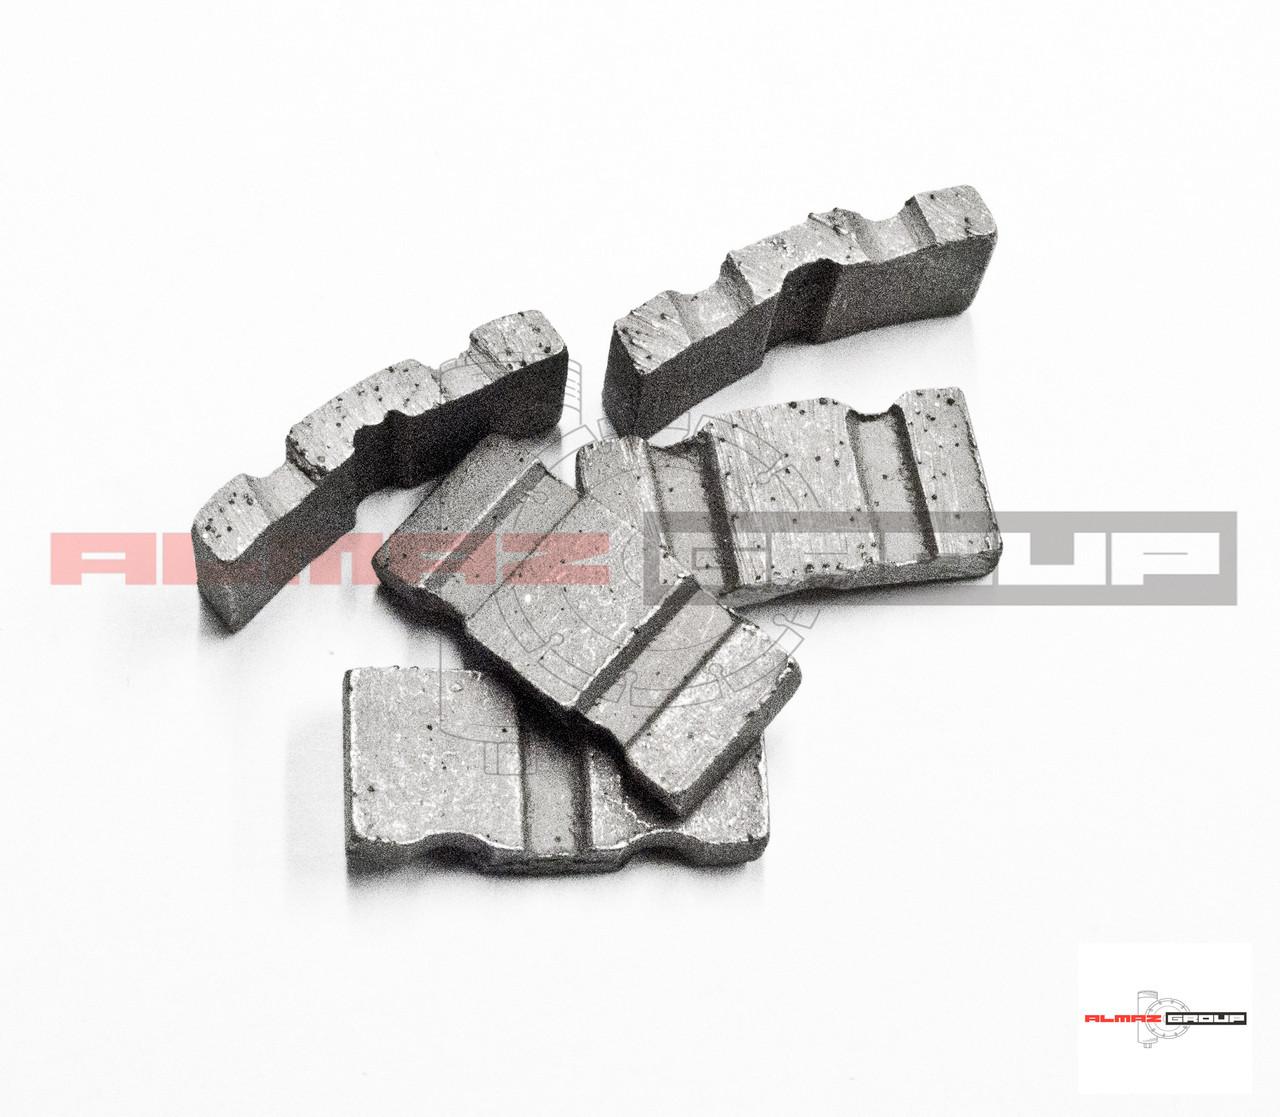 Реставрация алмазных коронок Ø 42 методом напайки сегмента TURBO-X